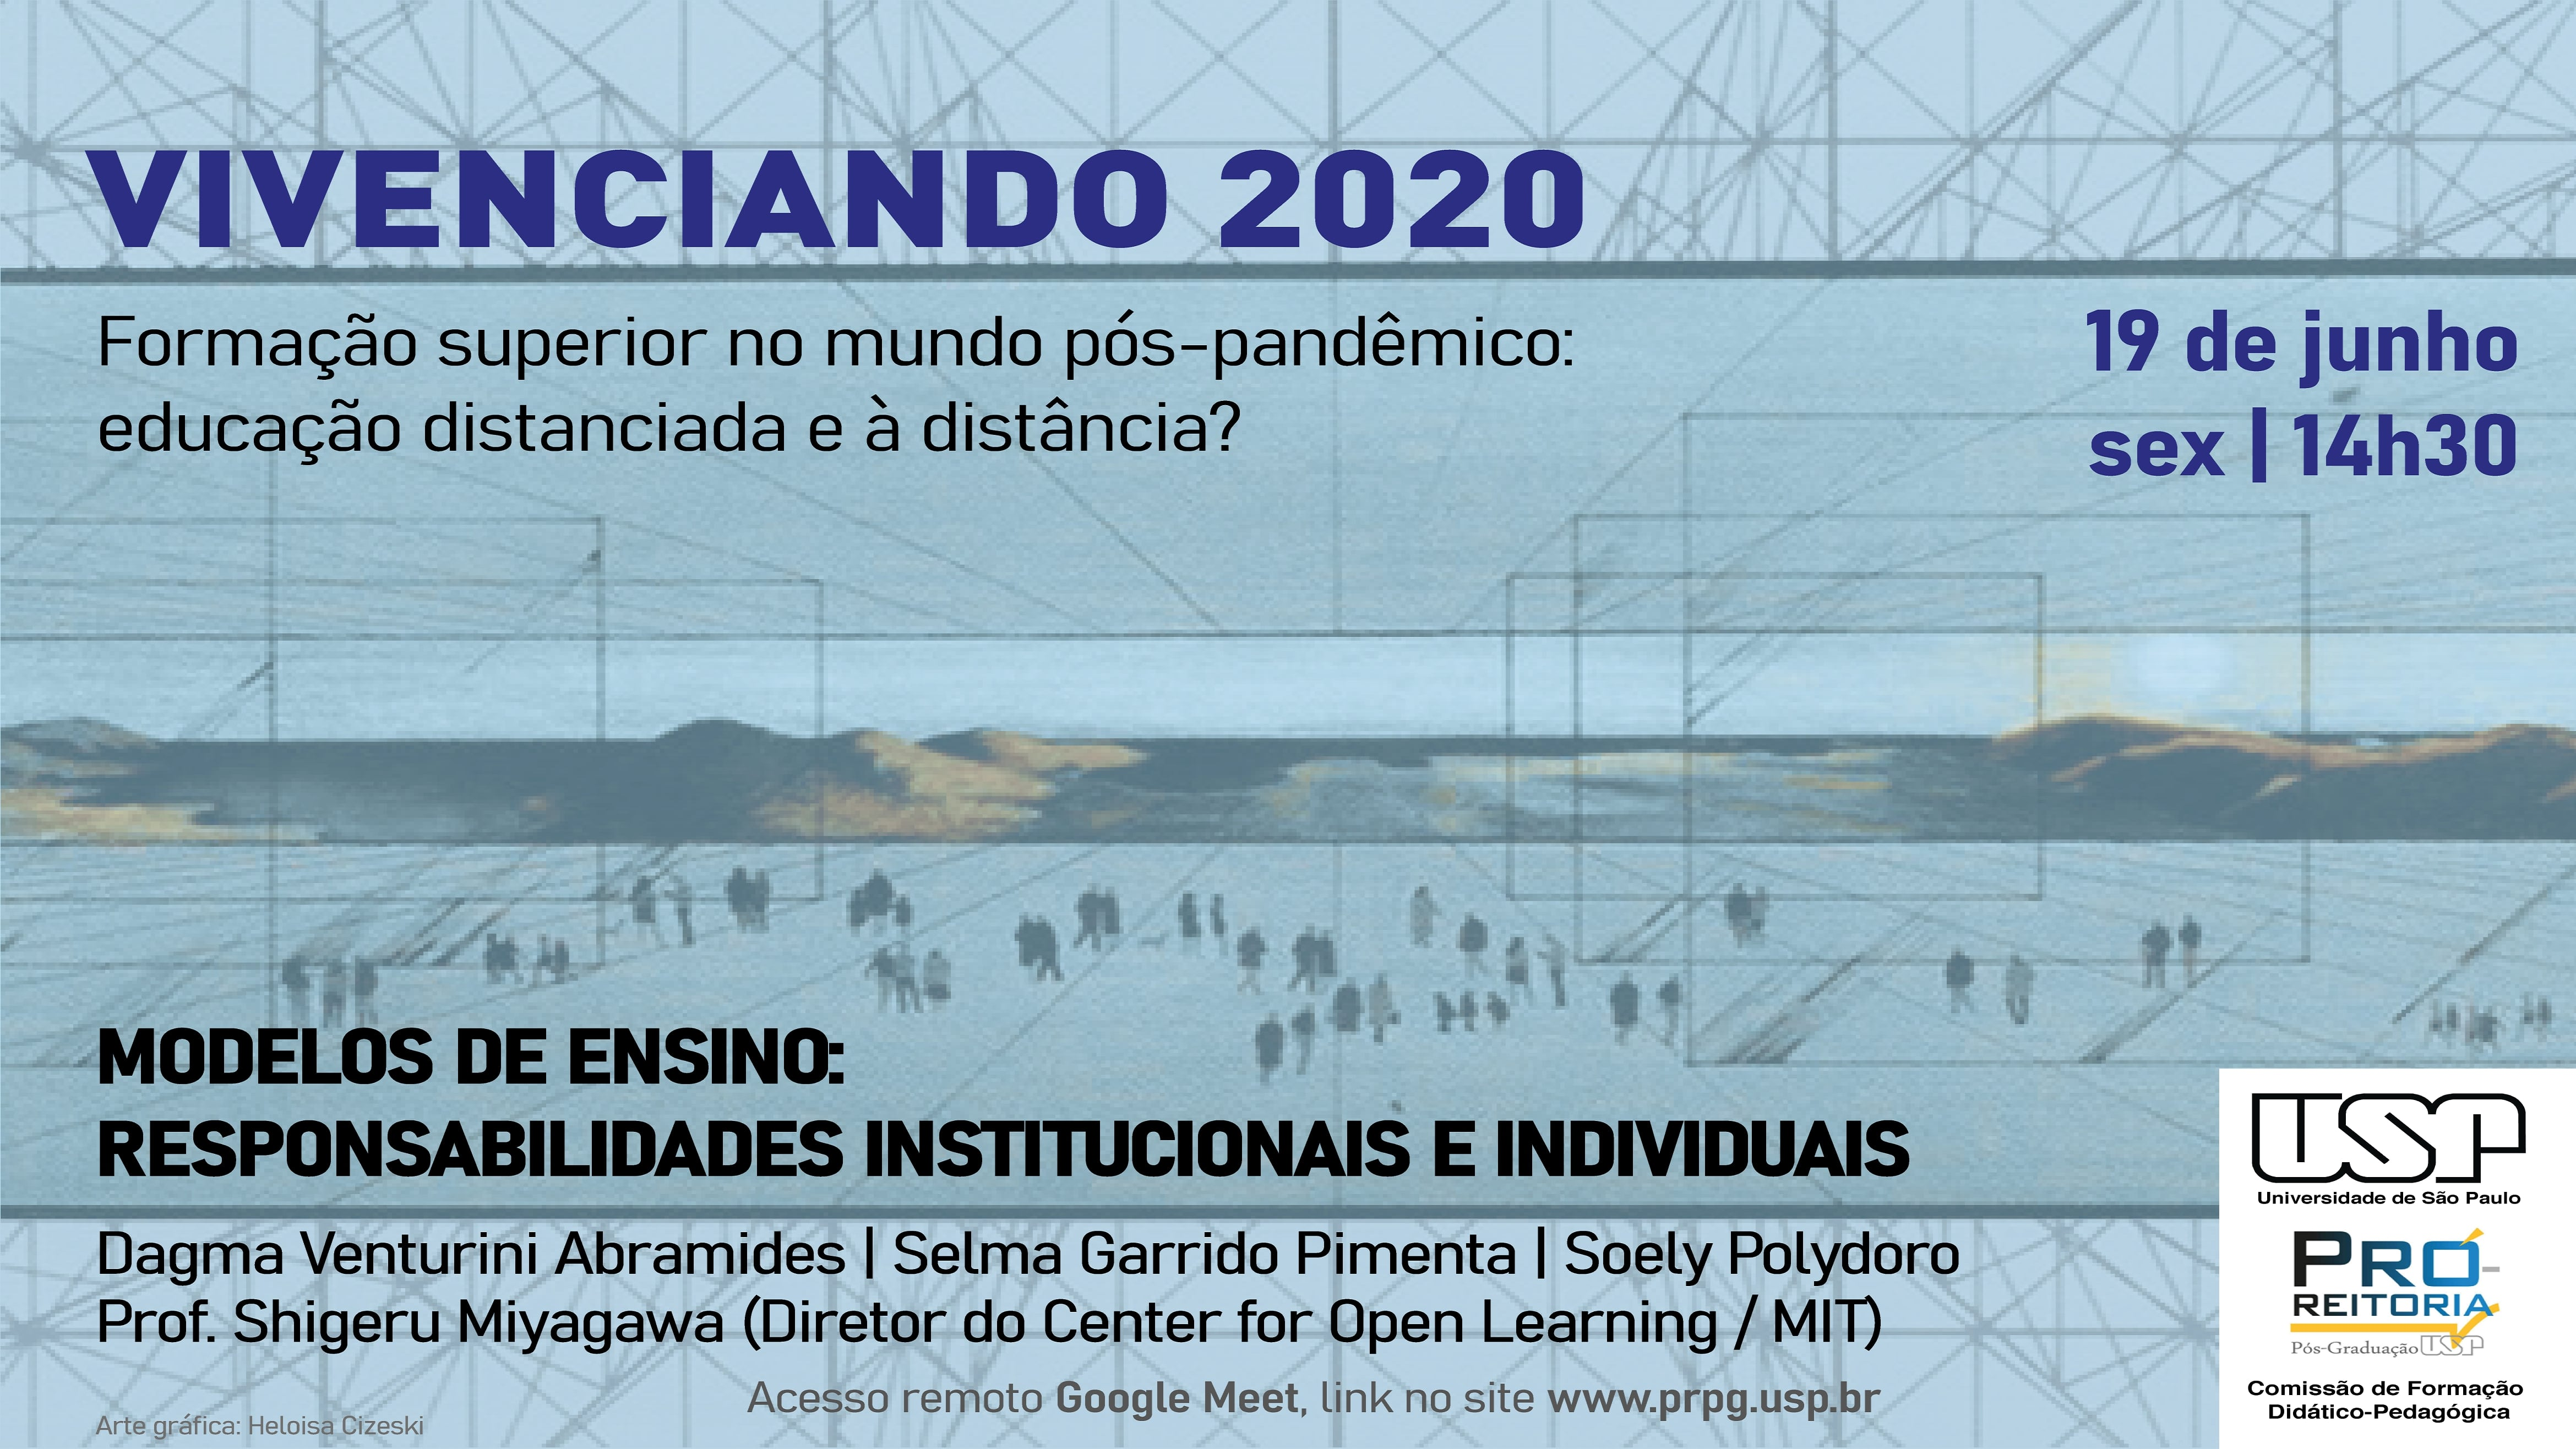 Vivenciando 2020 - Modelos de ensino: responsabilidades institucionais e individuais